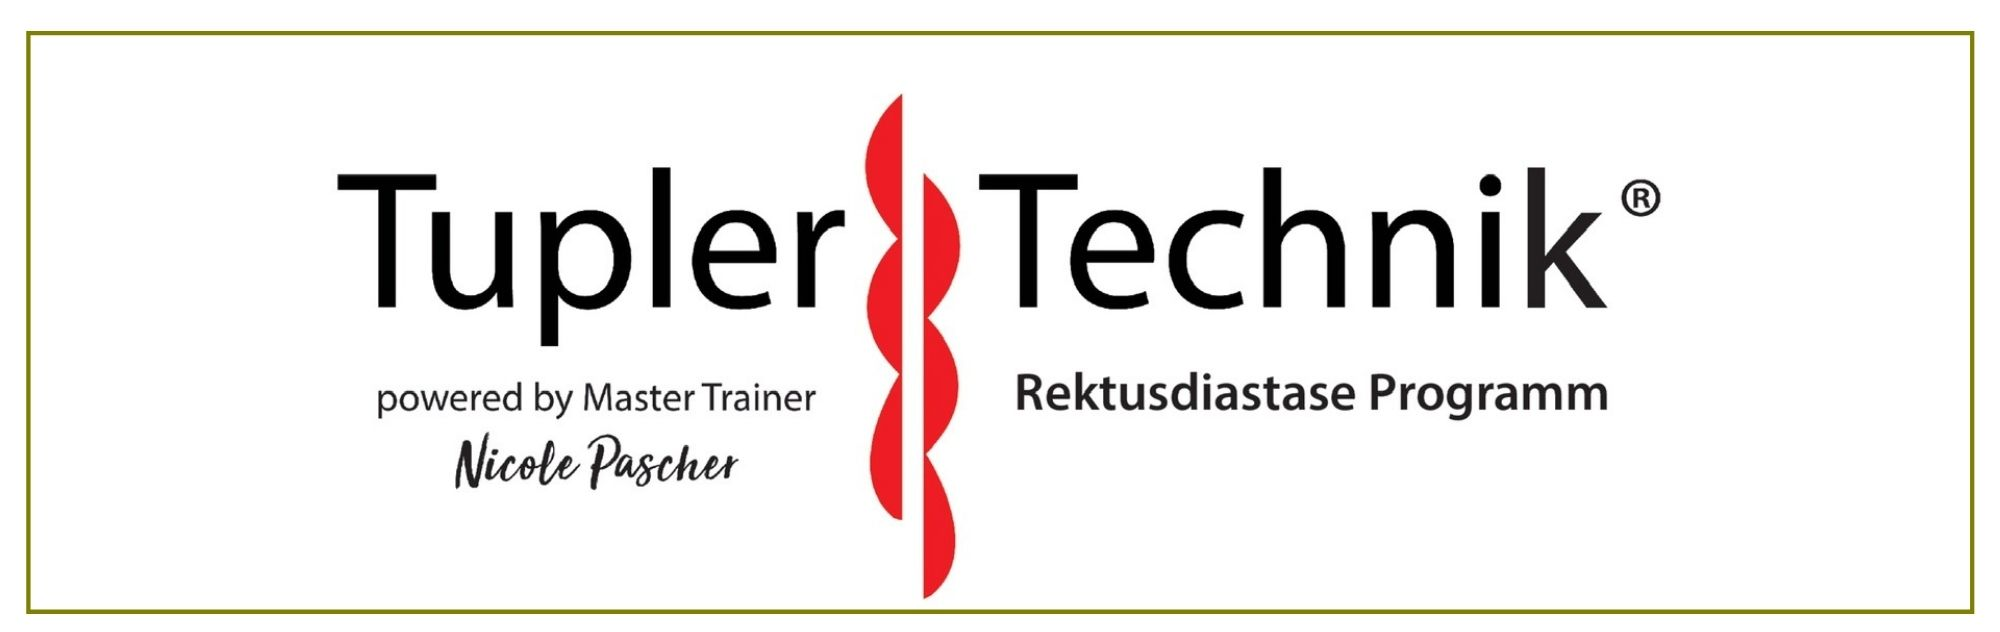 Tupler Technik, Anja Pohl, Tupler Halle